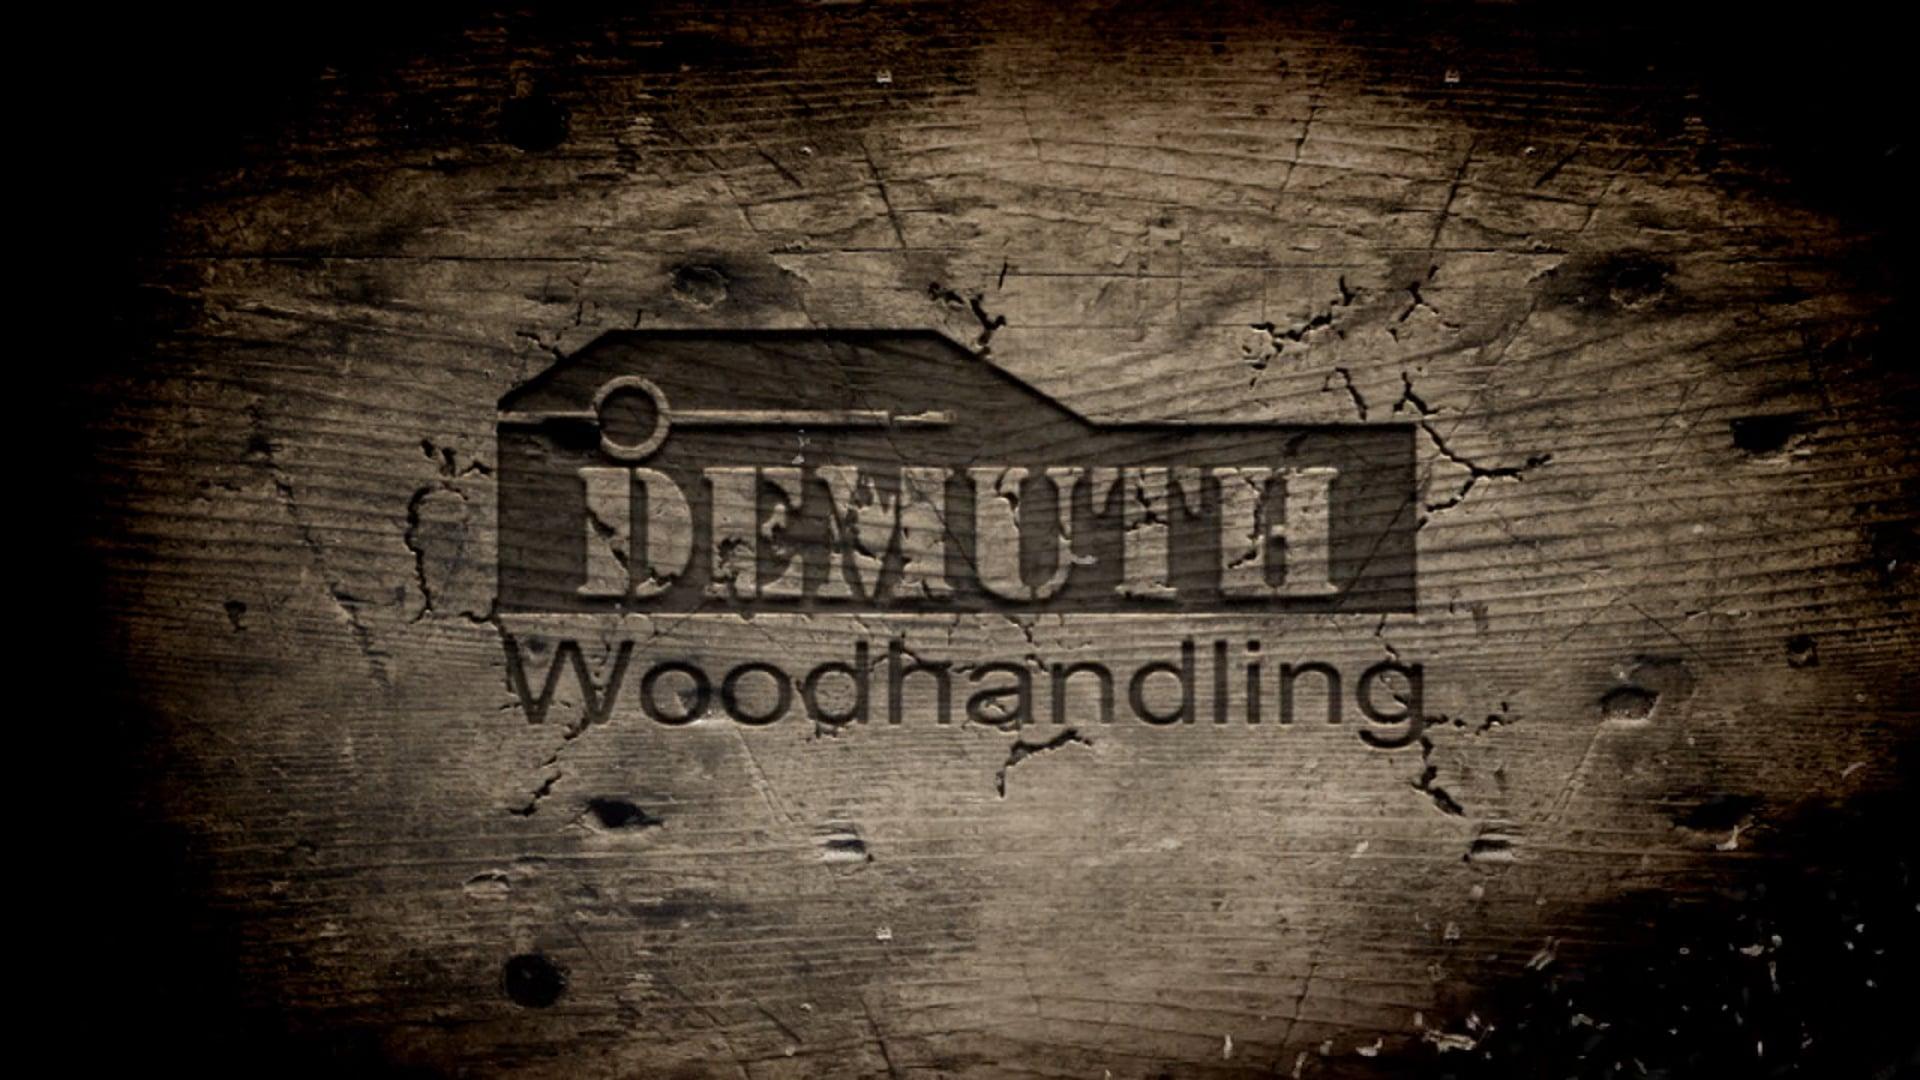 DEMUTH WOODYARDS - INSTITUCIONAL PROJETOS